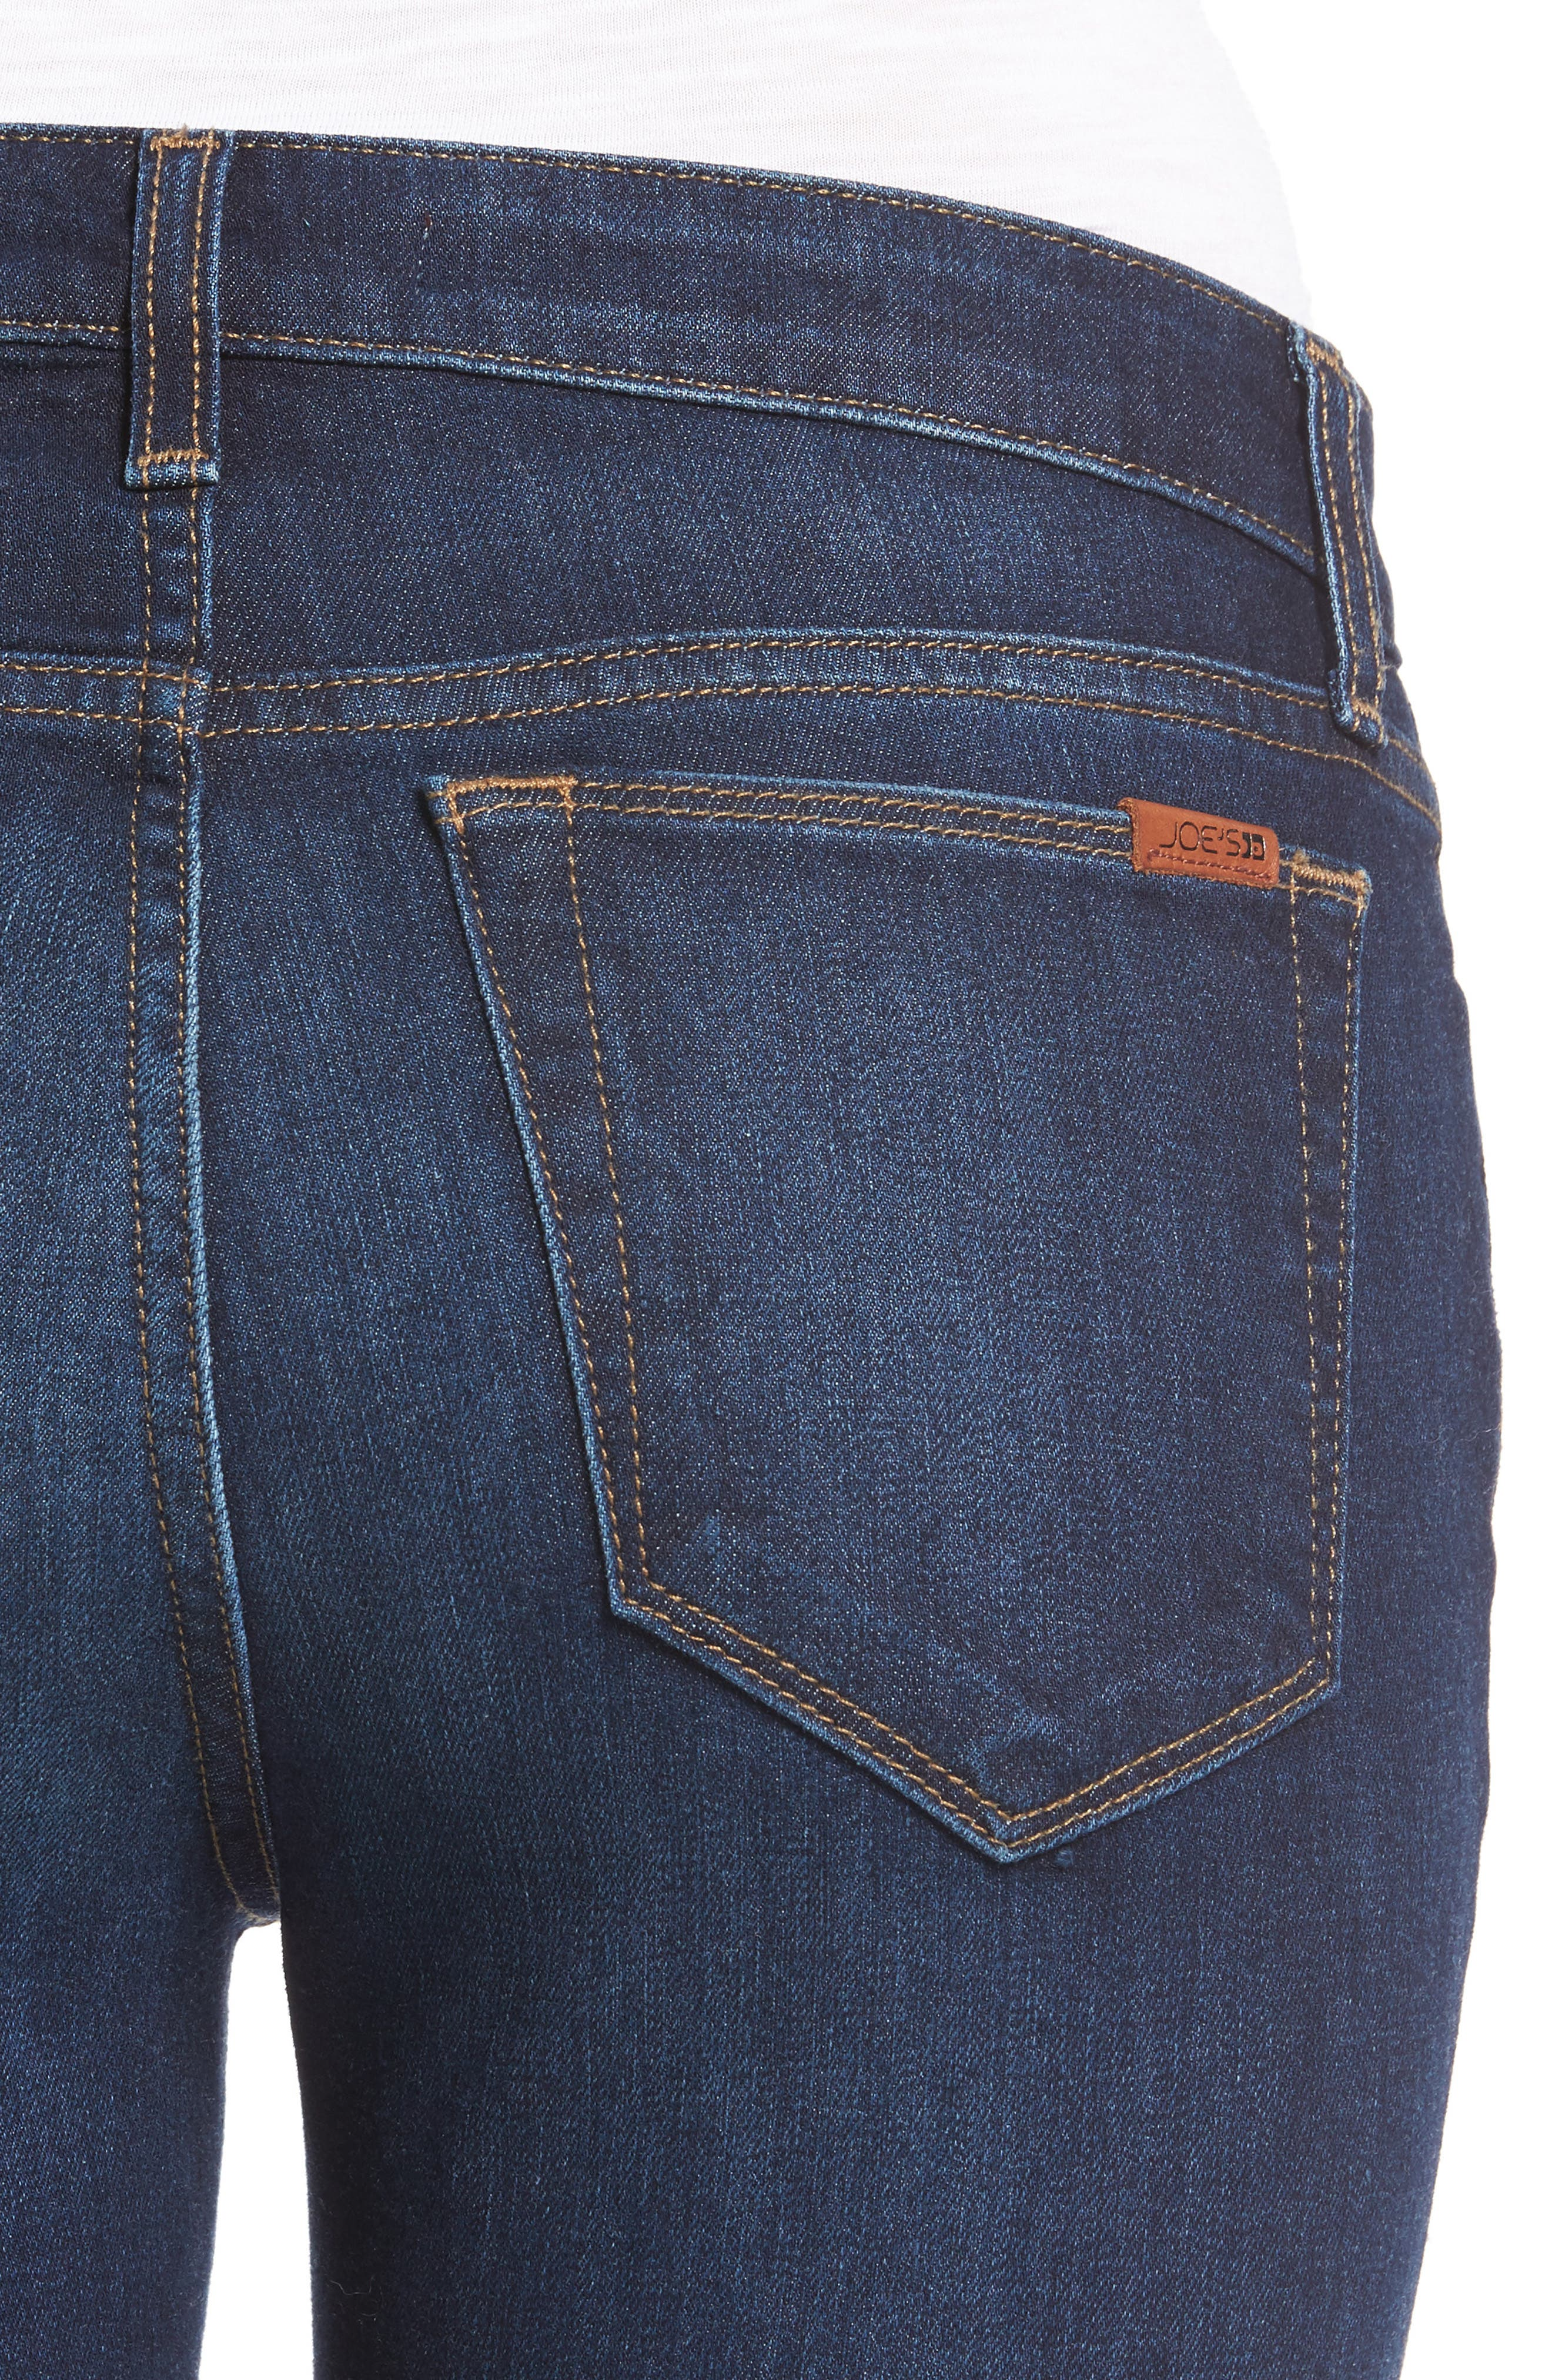 Icon Ankle Raw Hem Skinny Jeans,                             Alternate thumbnail 5, color,                             400